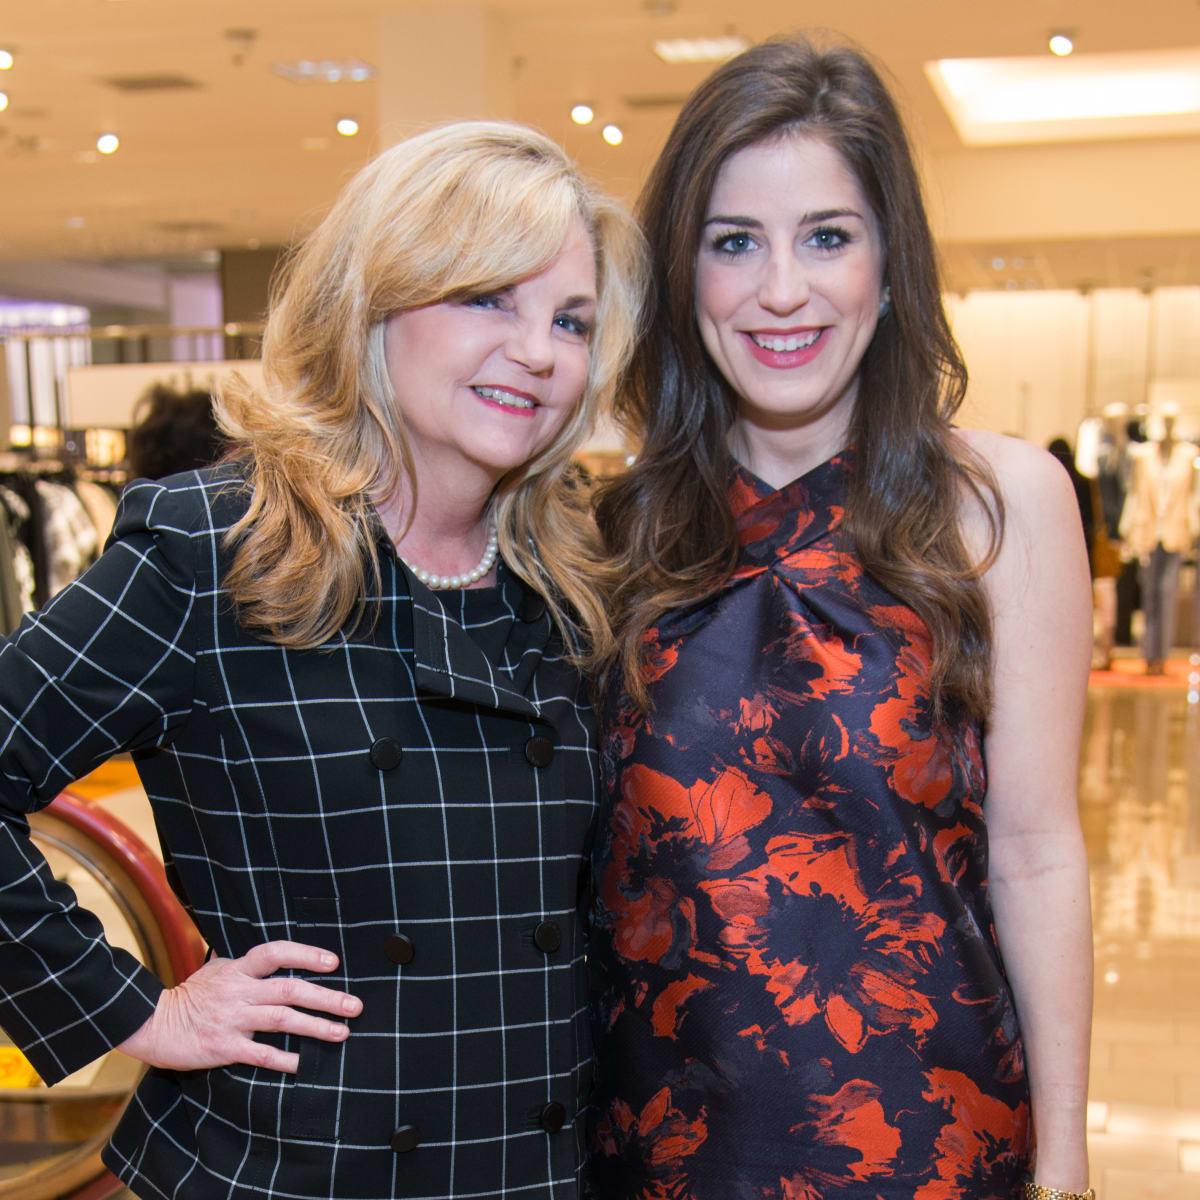 Kim Padgett, Laura Max Rose at Dress for Dinner